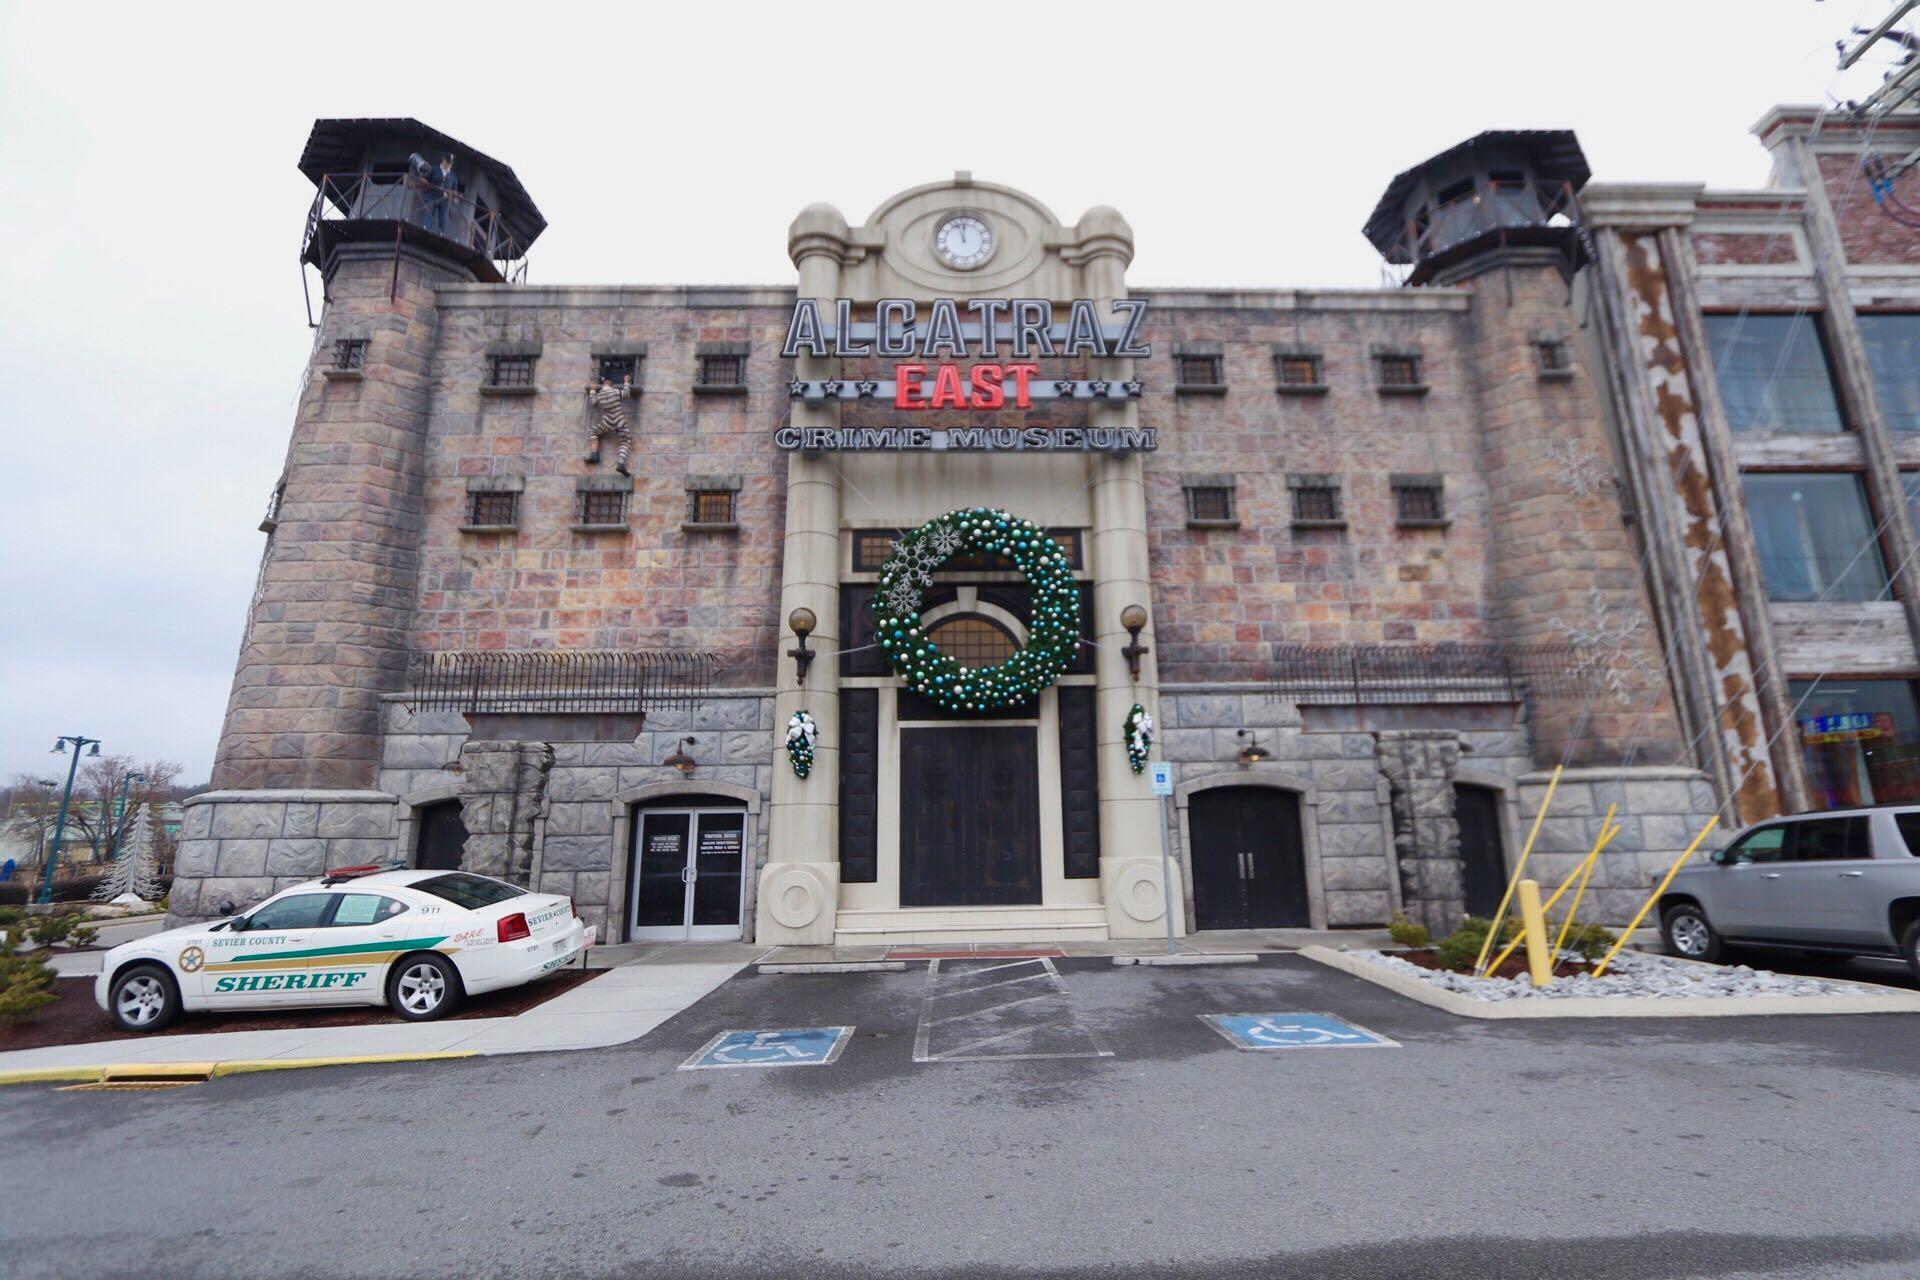 Alcatraz_East_crime_museum